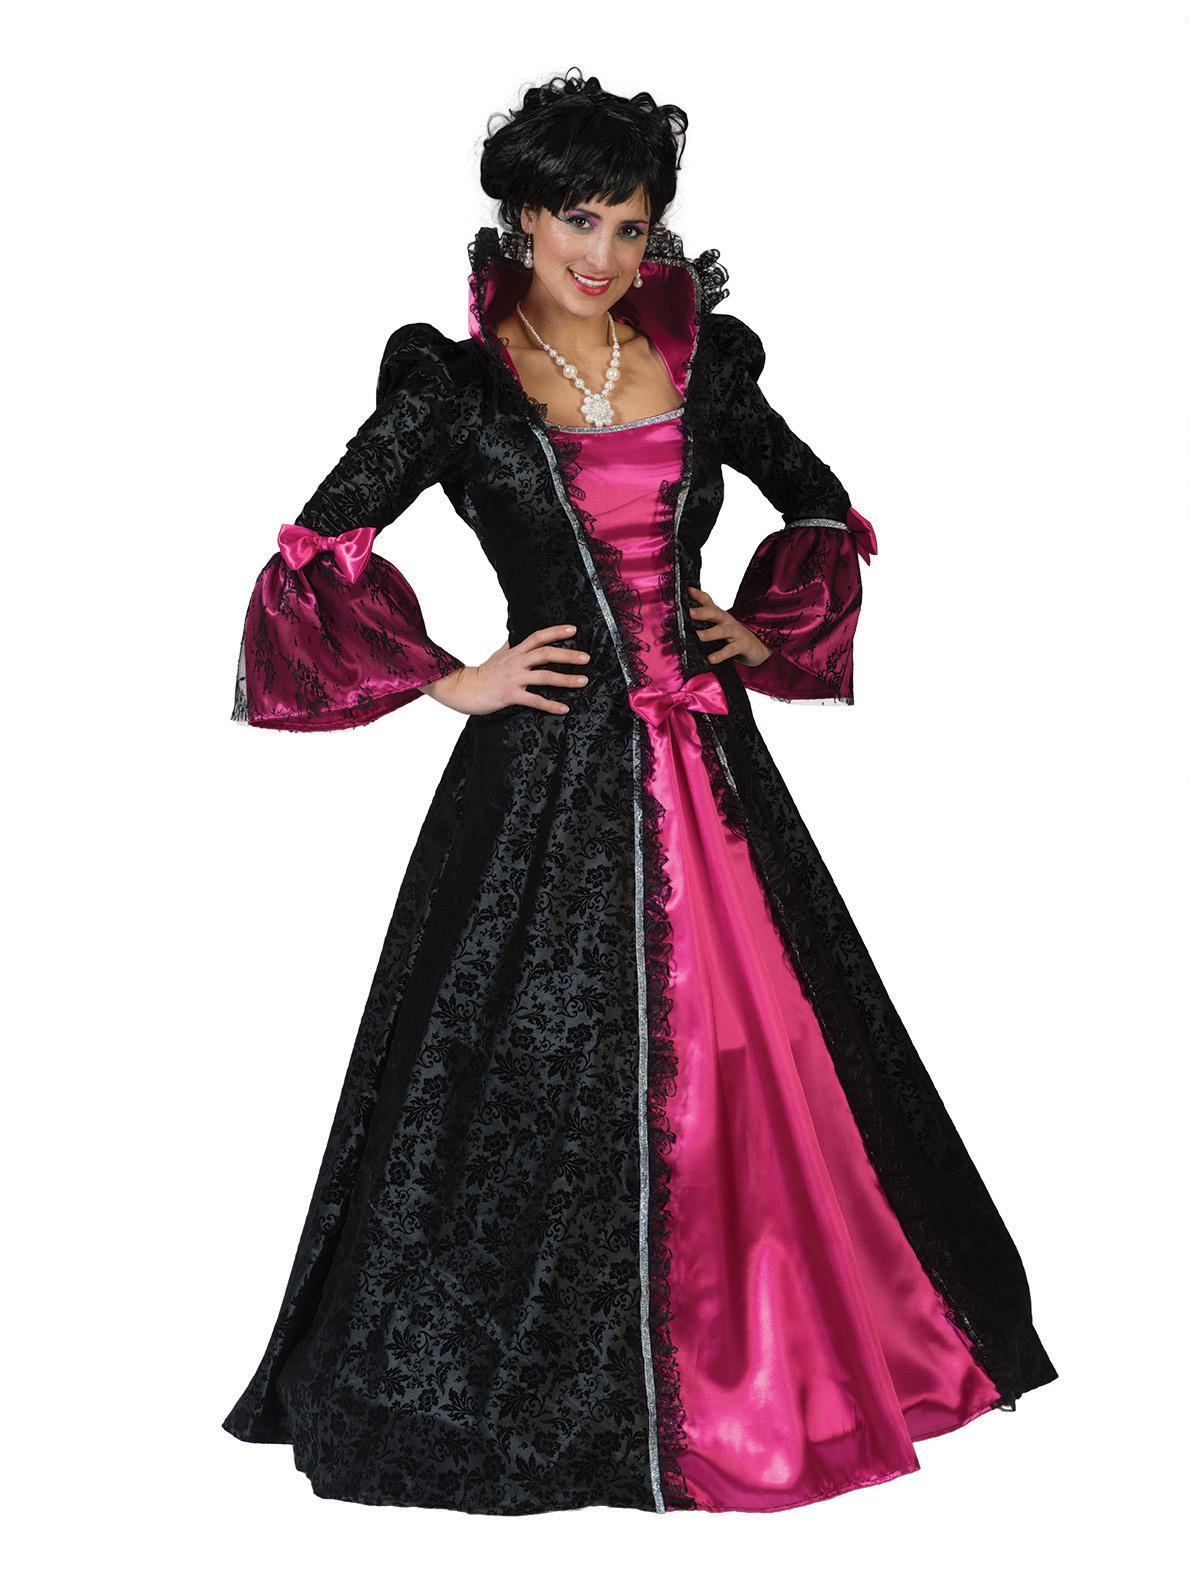 Madame Leonora